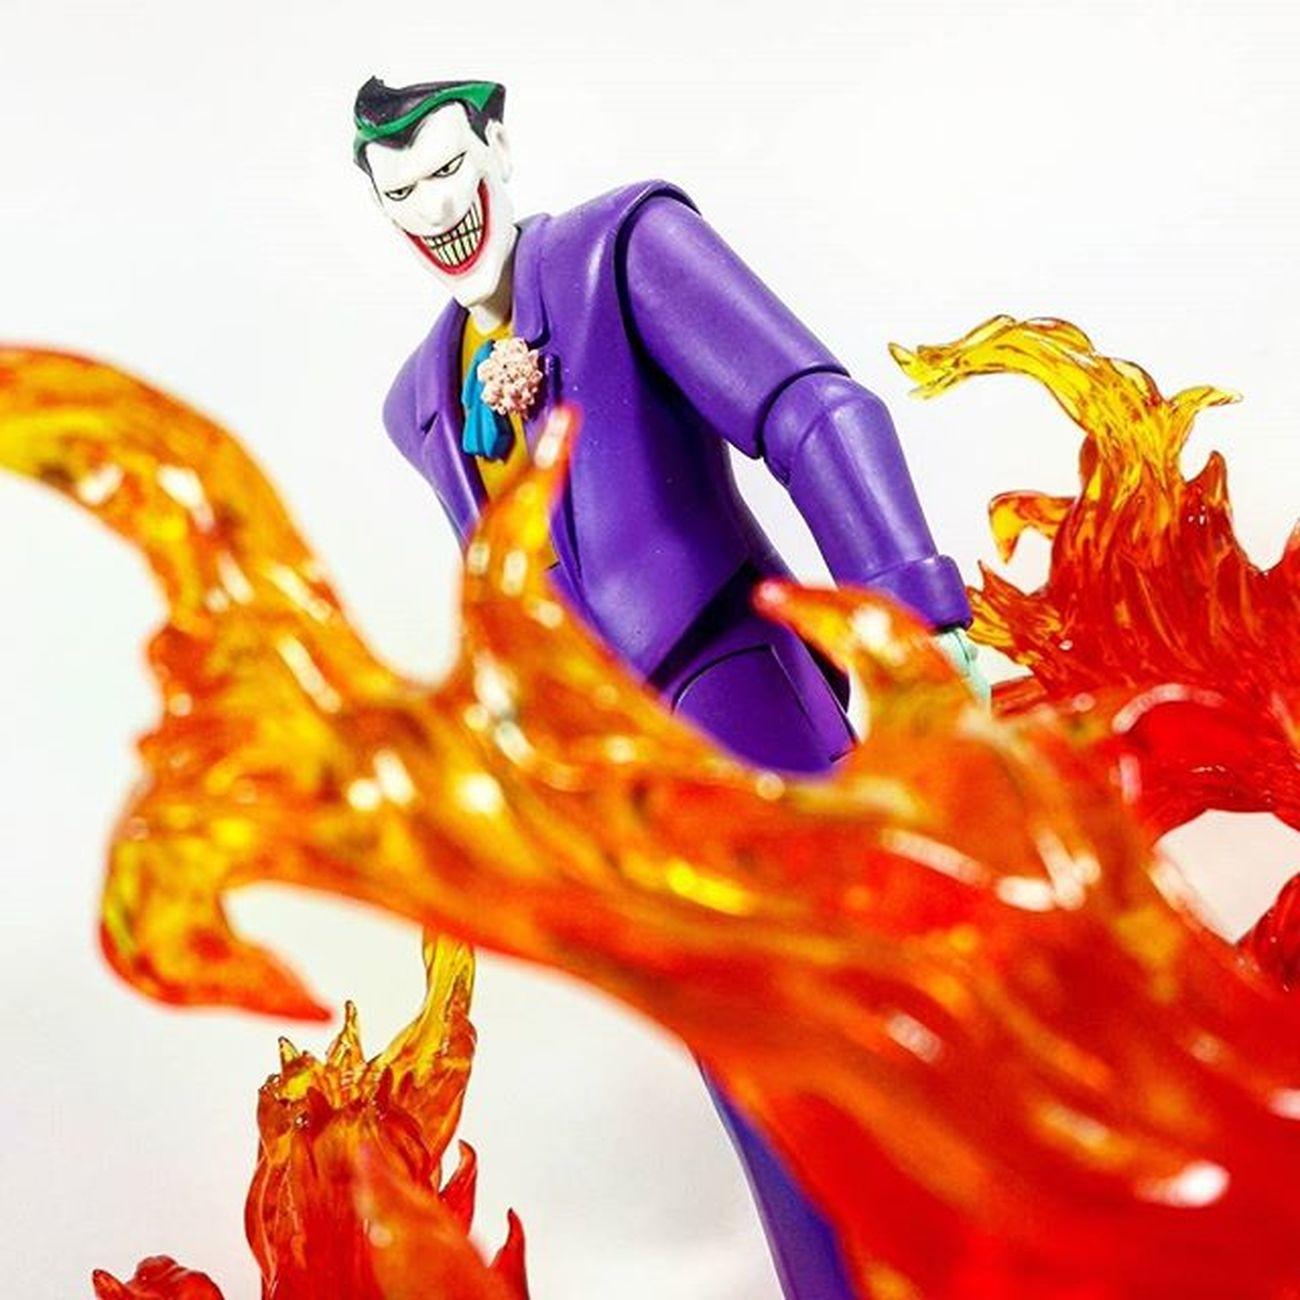 Joker Thejoker Jokerhere Batmananimatedseries Markhamill Clownprinceofcrime Batman Dccomics Toys Toyphotography Toypizza Toysarehellasick Toycollector Toycommunity Toycollection Thefigureverse Ata_dreadnoughts Toyslagram Toyunion